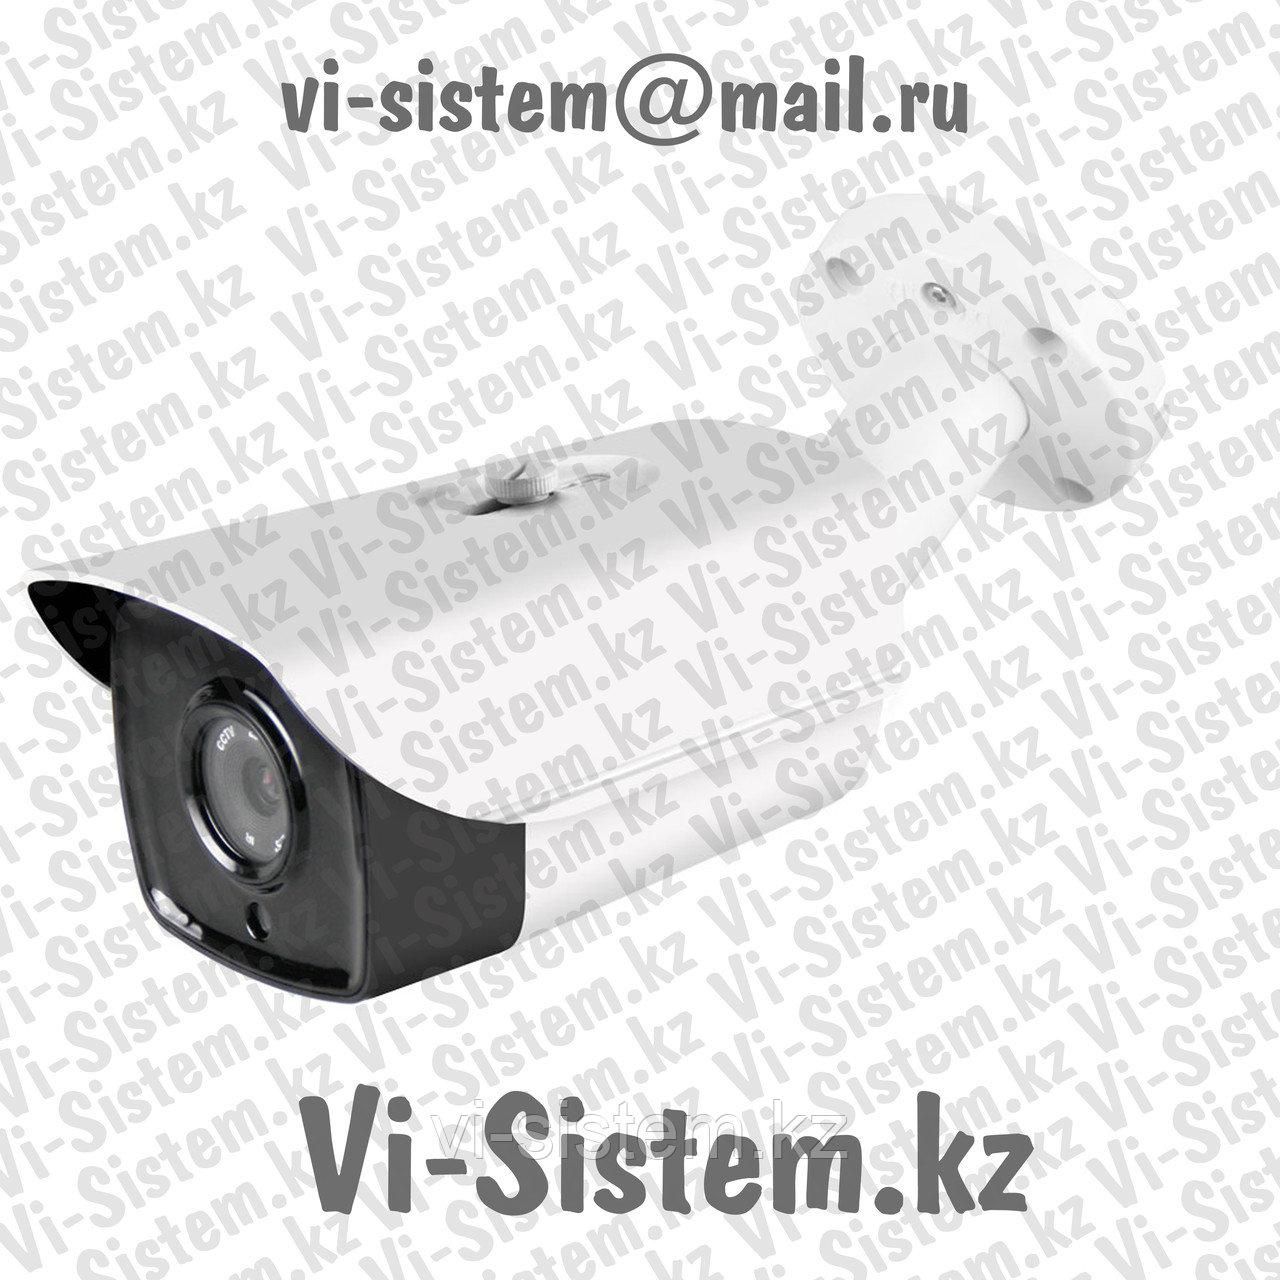 AHD-Видеокамера SYNQAR SY-893 2MP